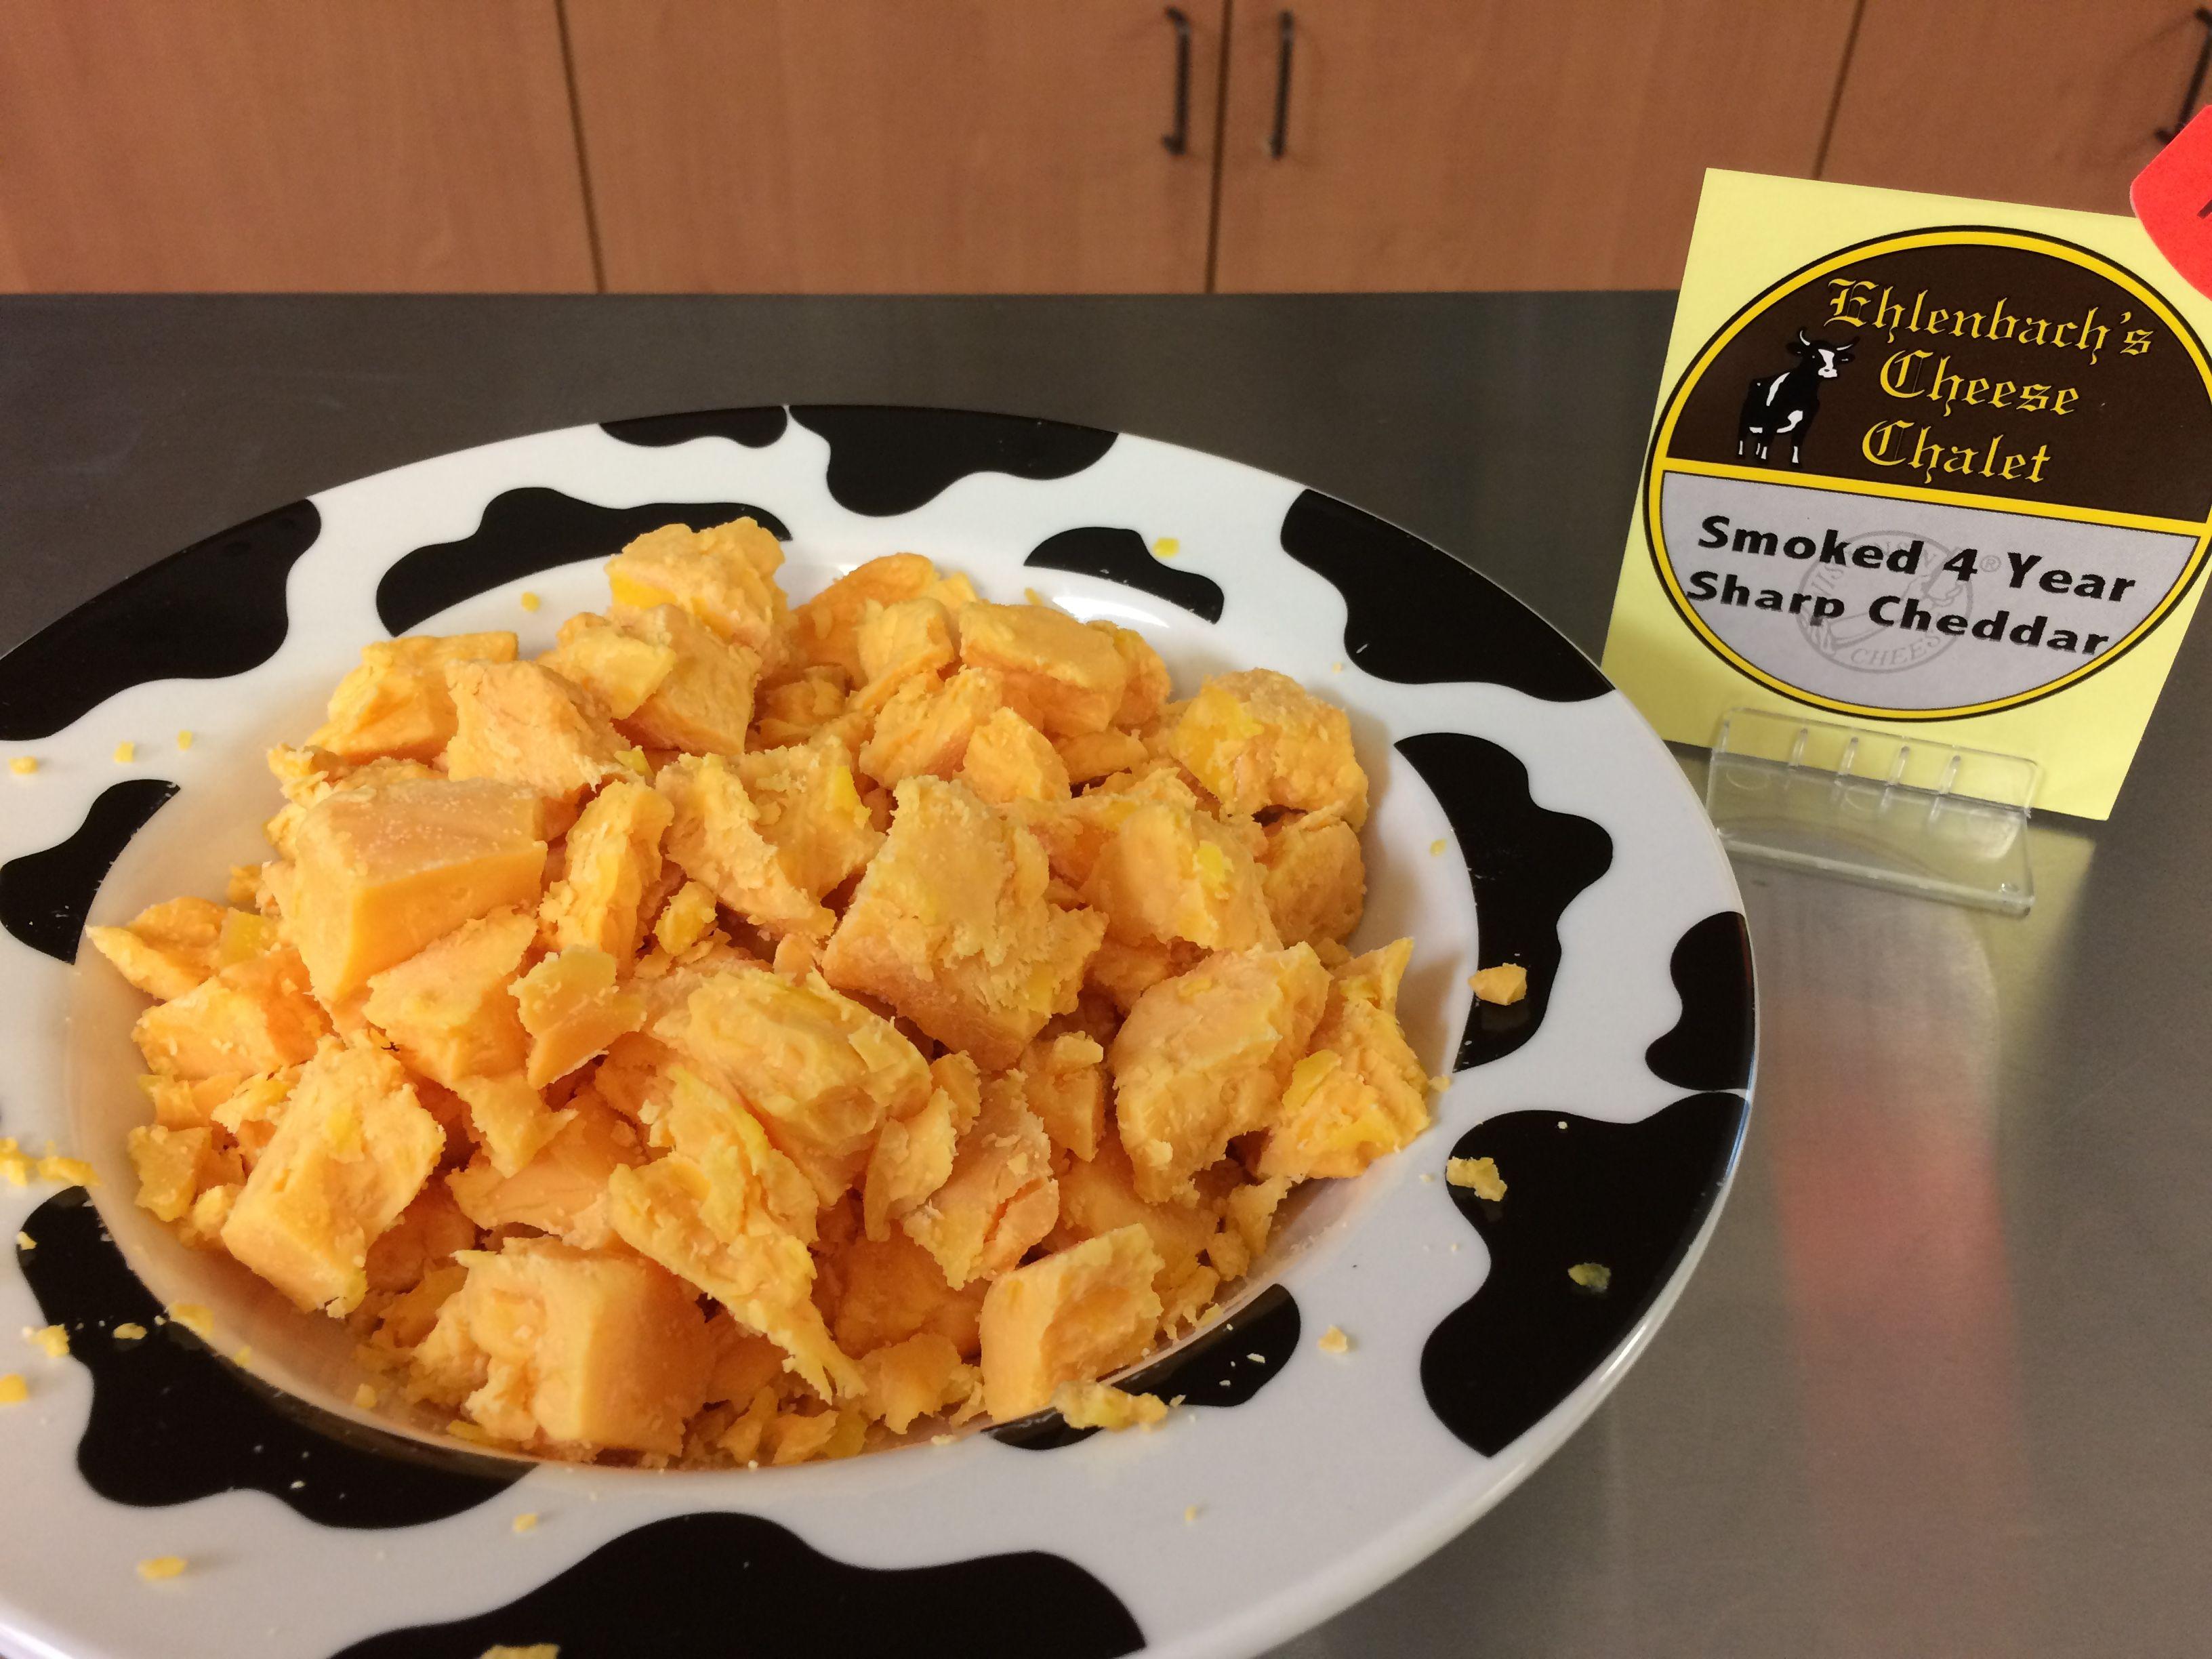 Applewood smoked 4 year sharp cheddar smokedcheese